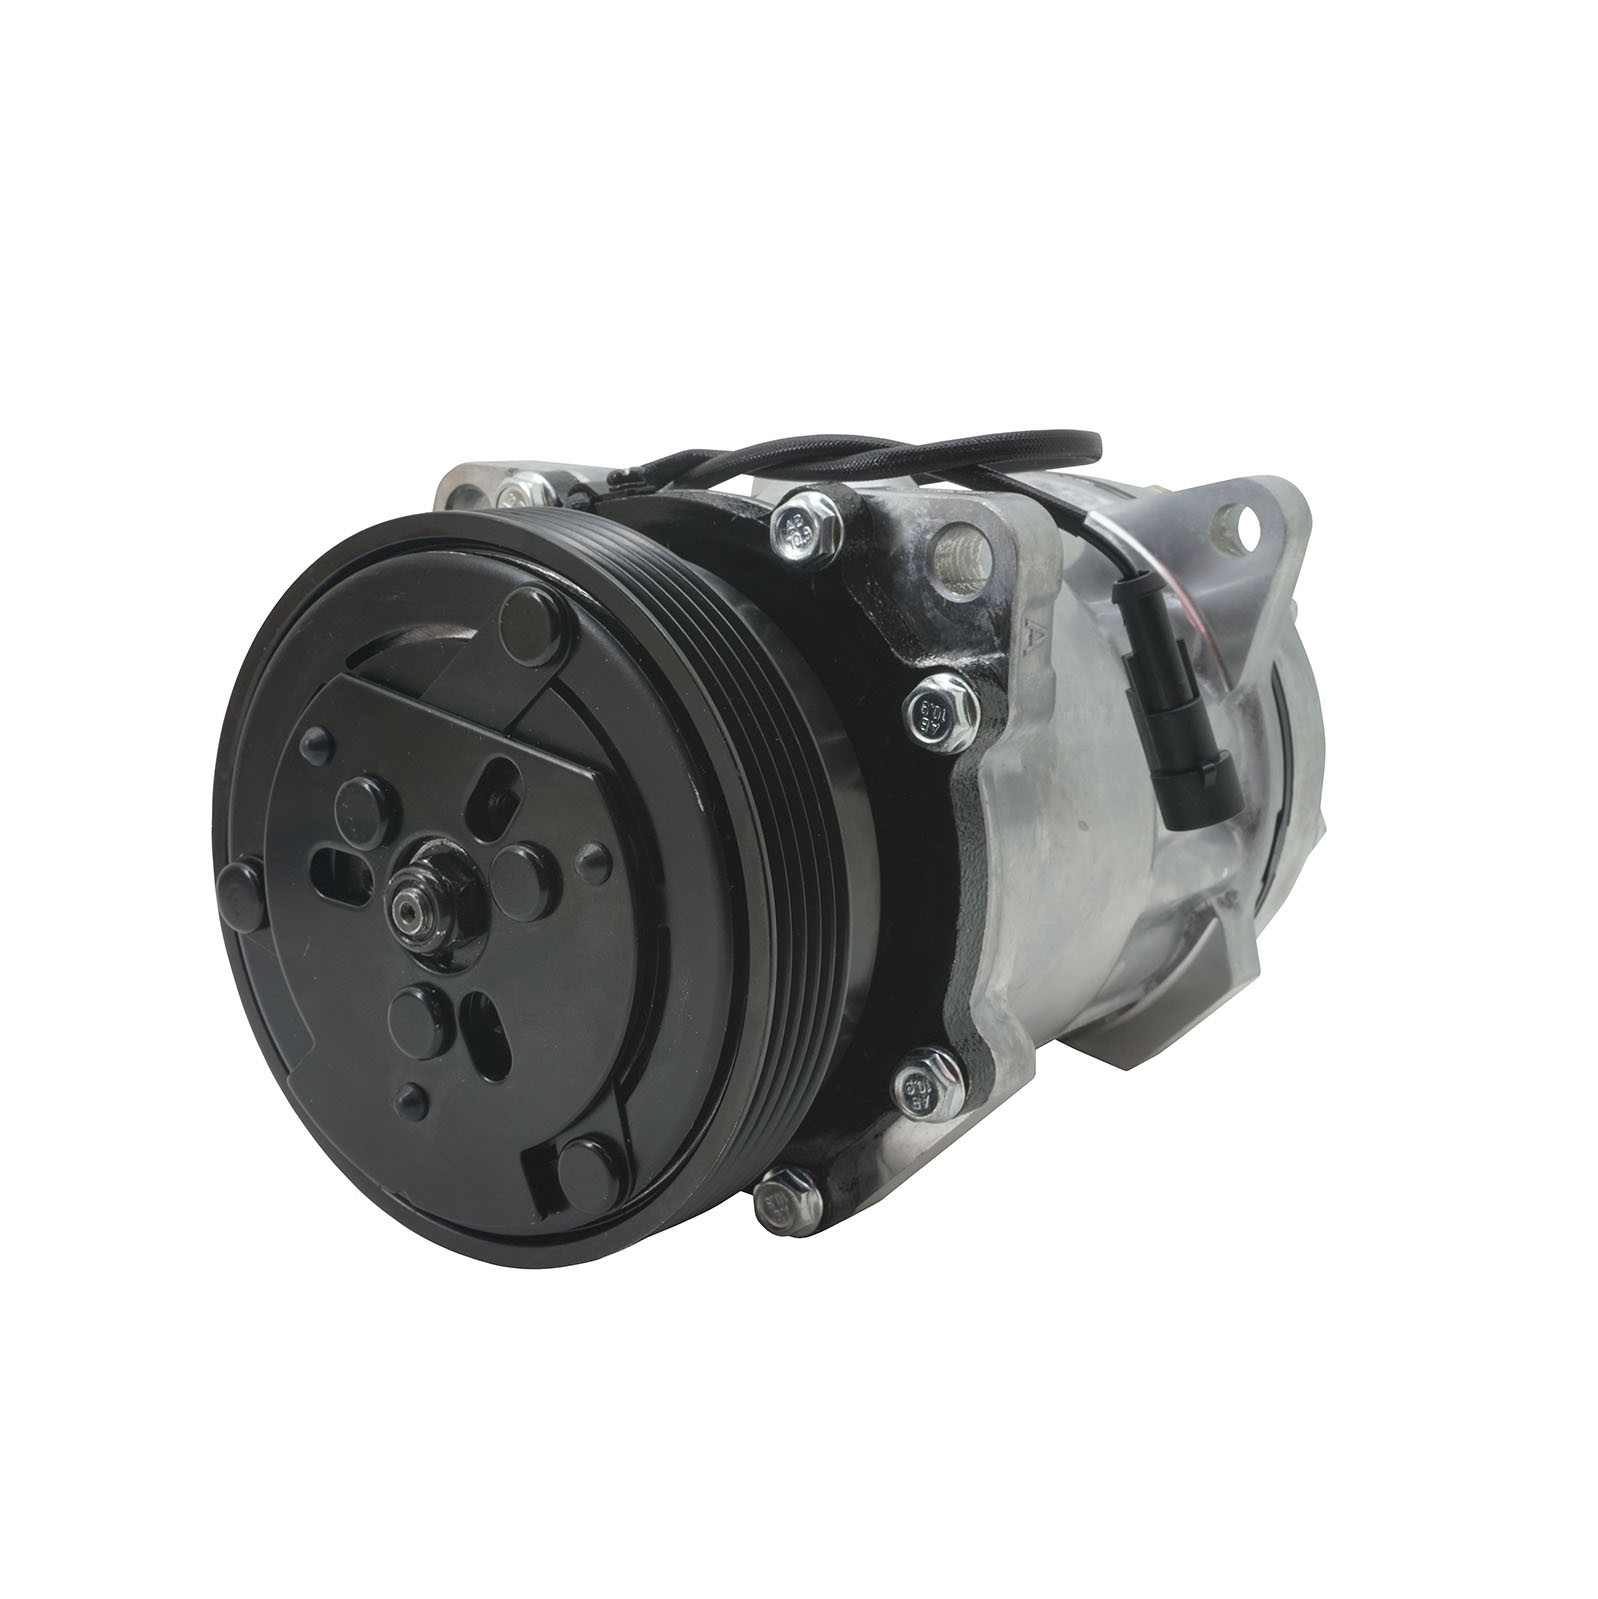 Compressor 7H15 5PK 12V Ducato, Boxer e Jumper Diesel 2.8 de 2006 até 2017